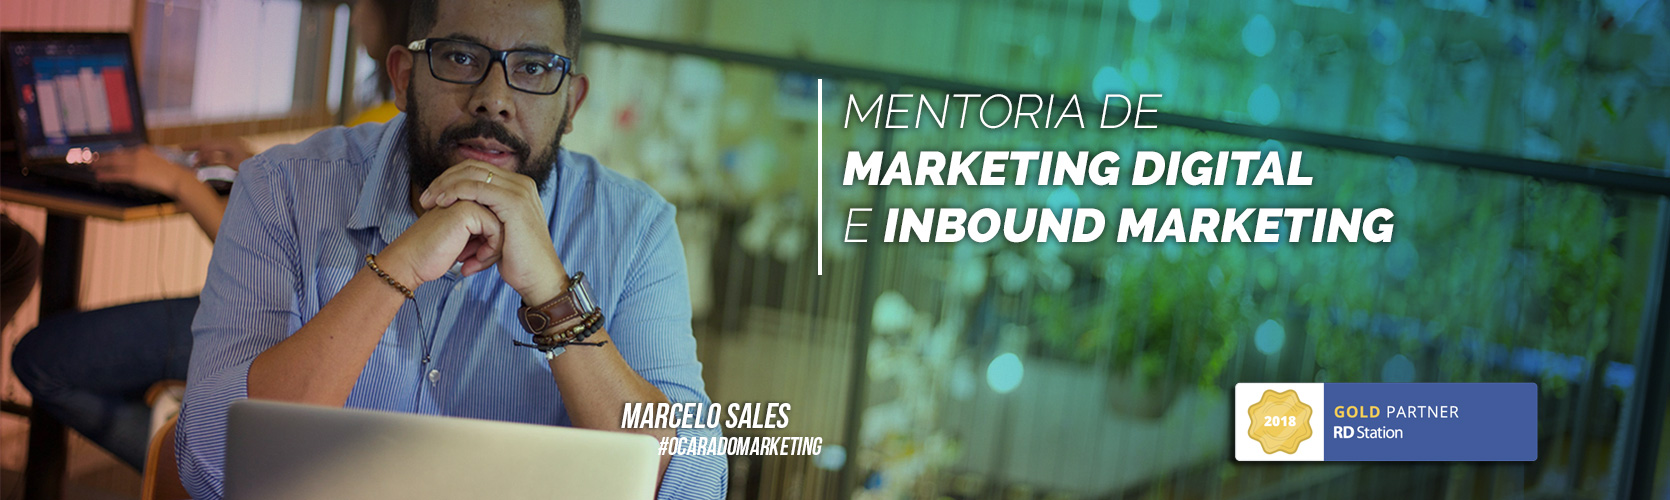 marcelo-sales-o-cara-do-marketing-1-1